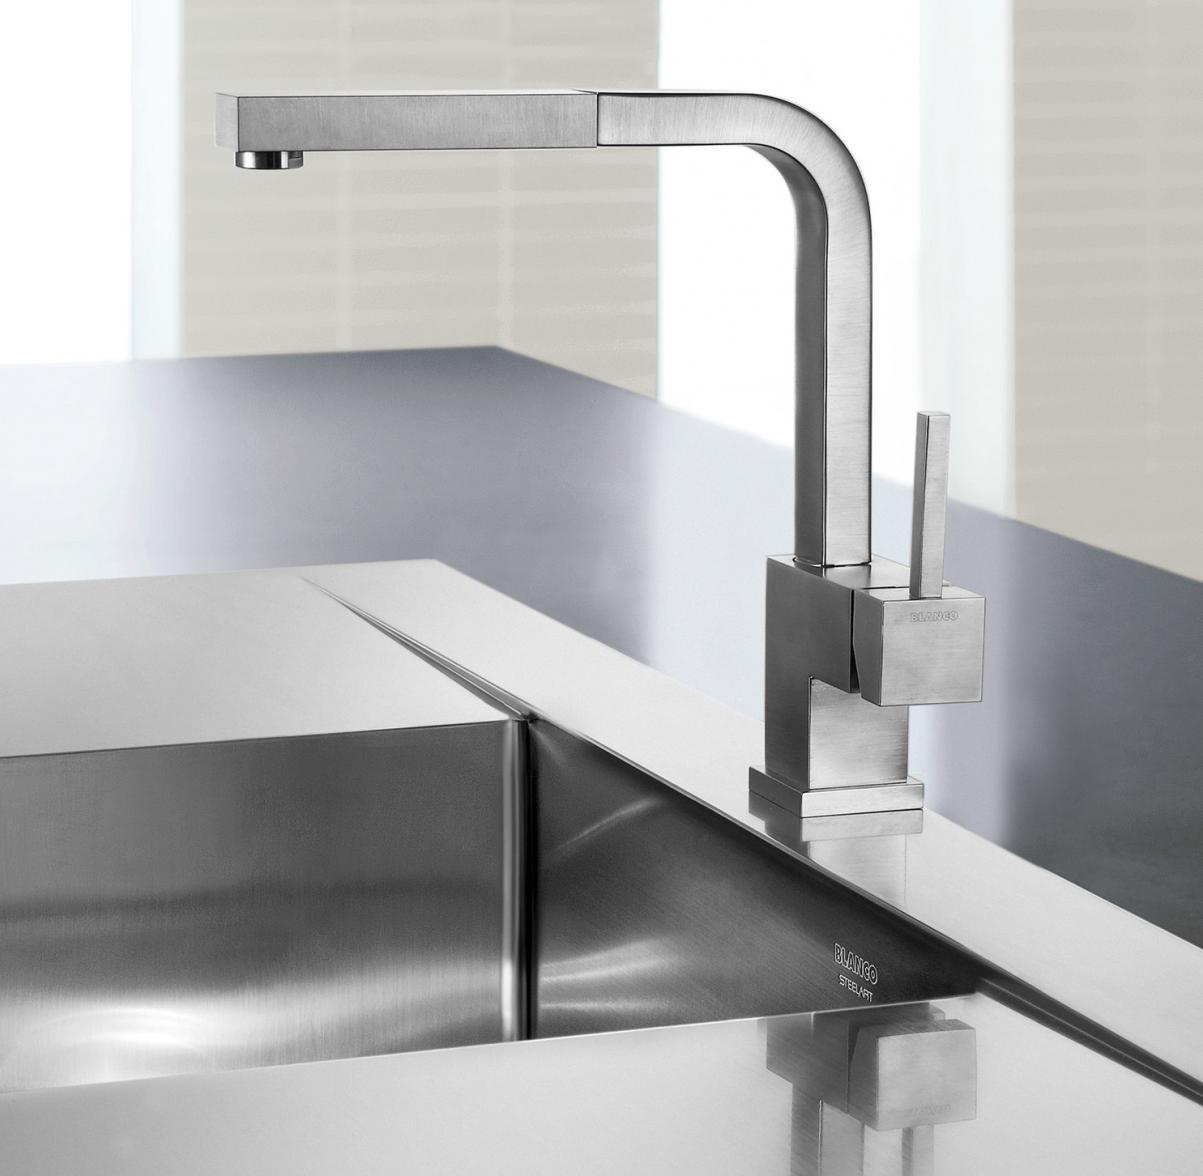 Ideas, kwc domo faucet cartridge kwc domo faucet cartridge kwc luna faucet road house site road house site 1203 x 1176  .